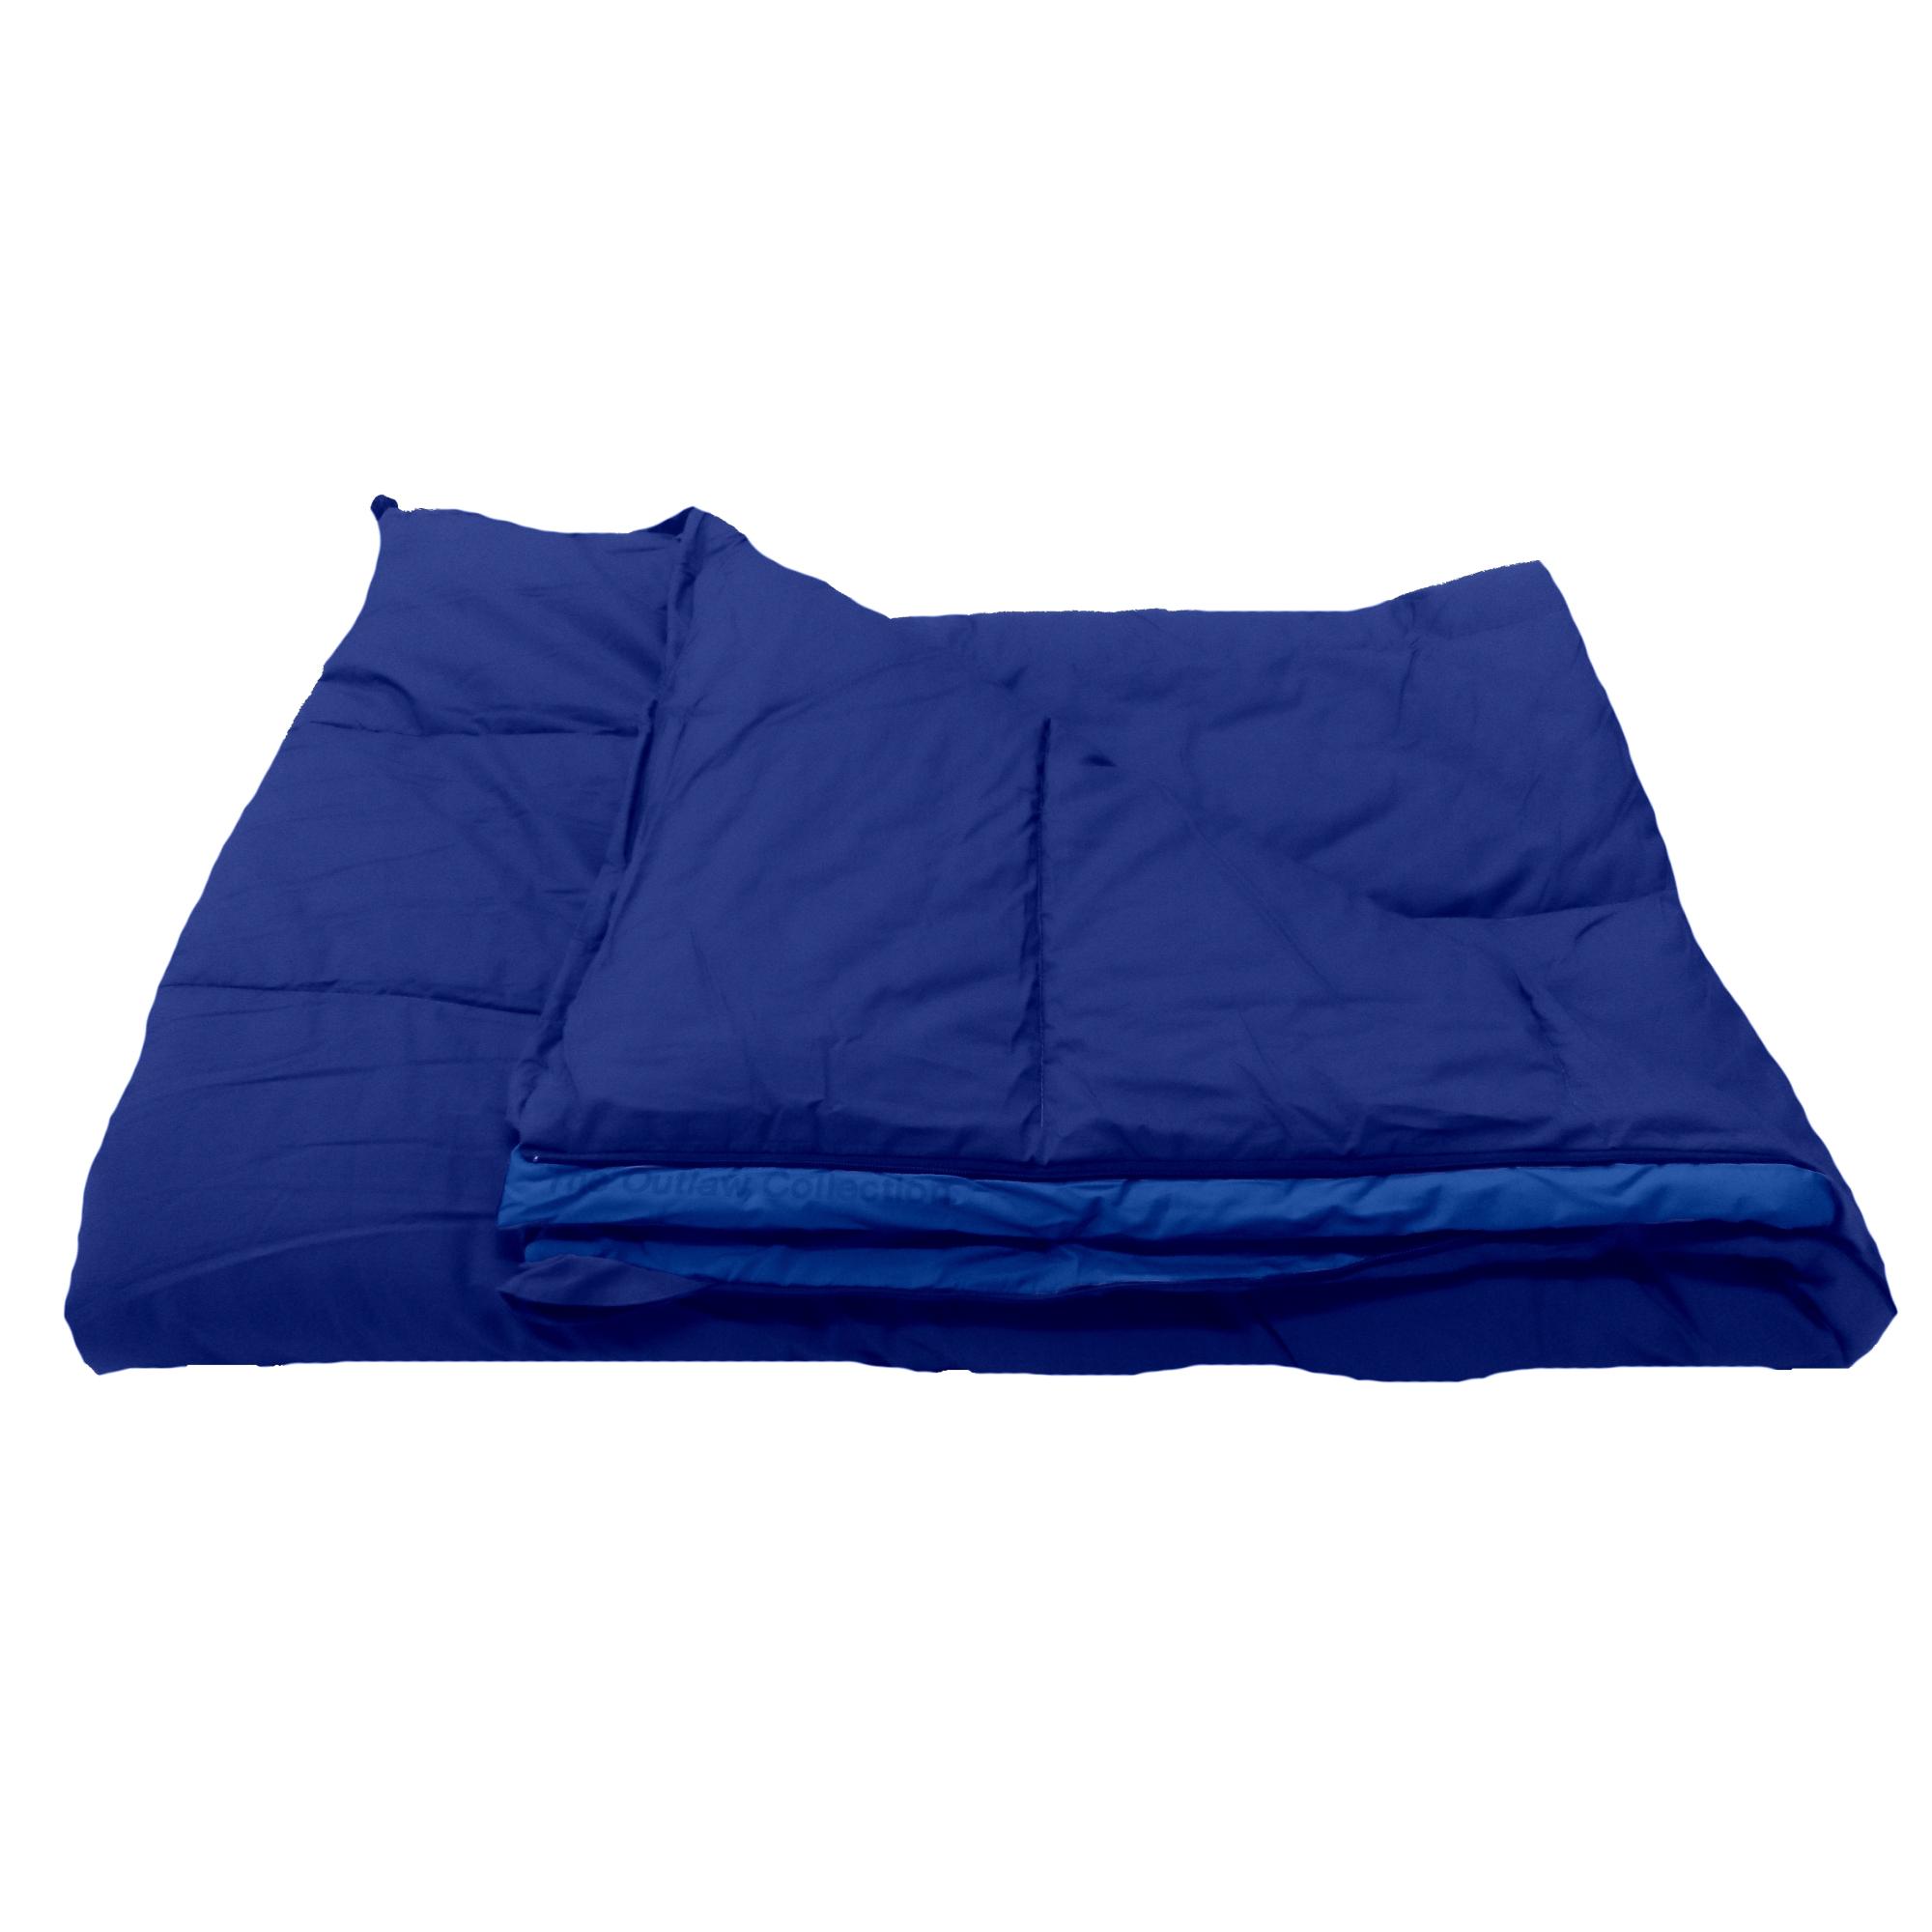 Maverick dekenmodel slaapzak